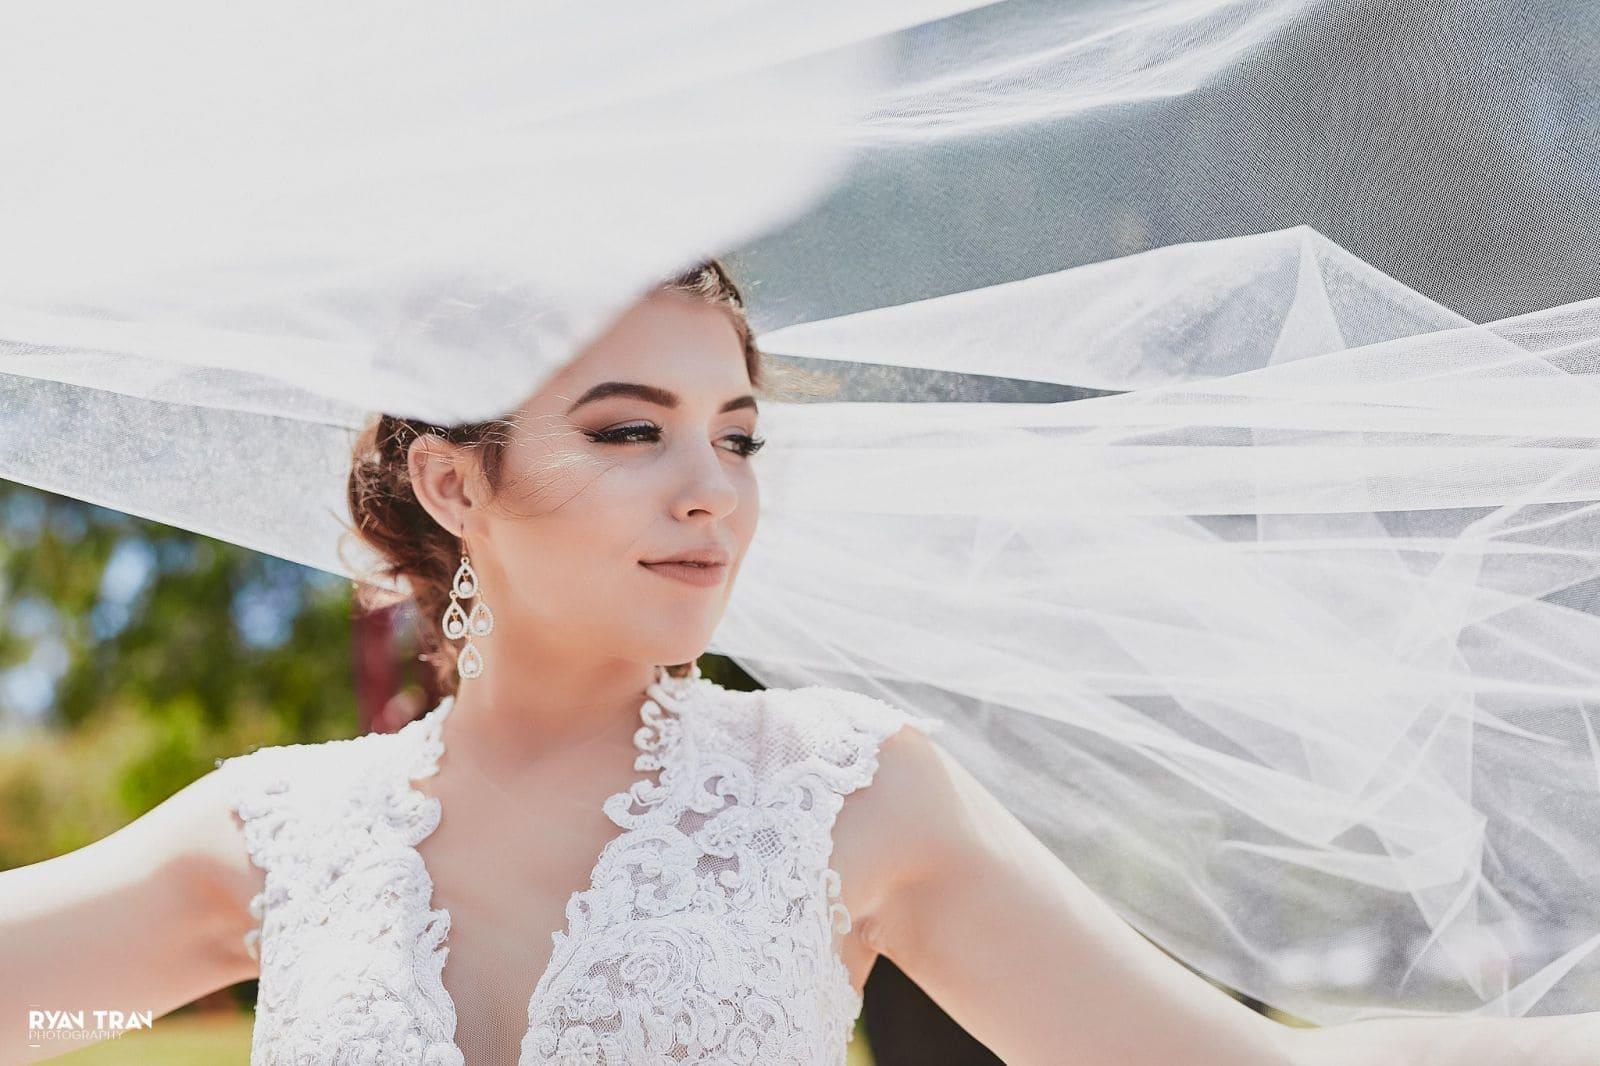 Perth Wedding Photographer - Ryan Tran Photography